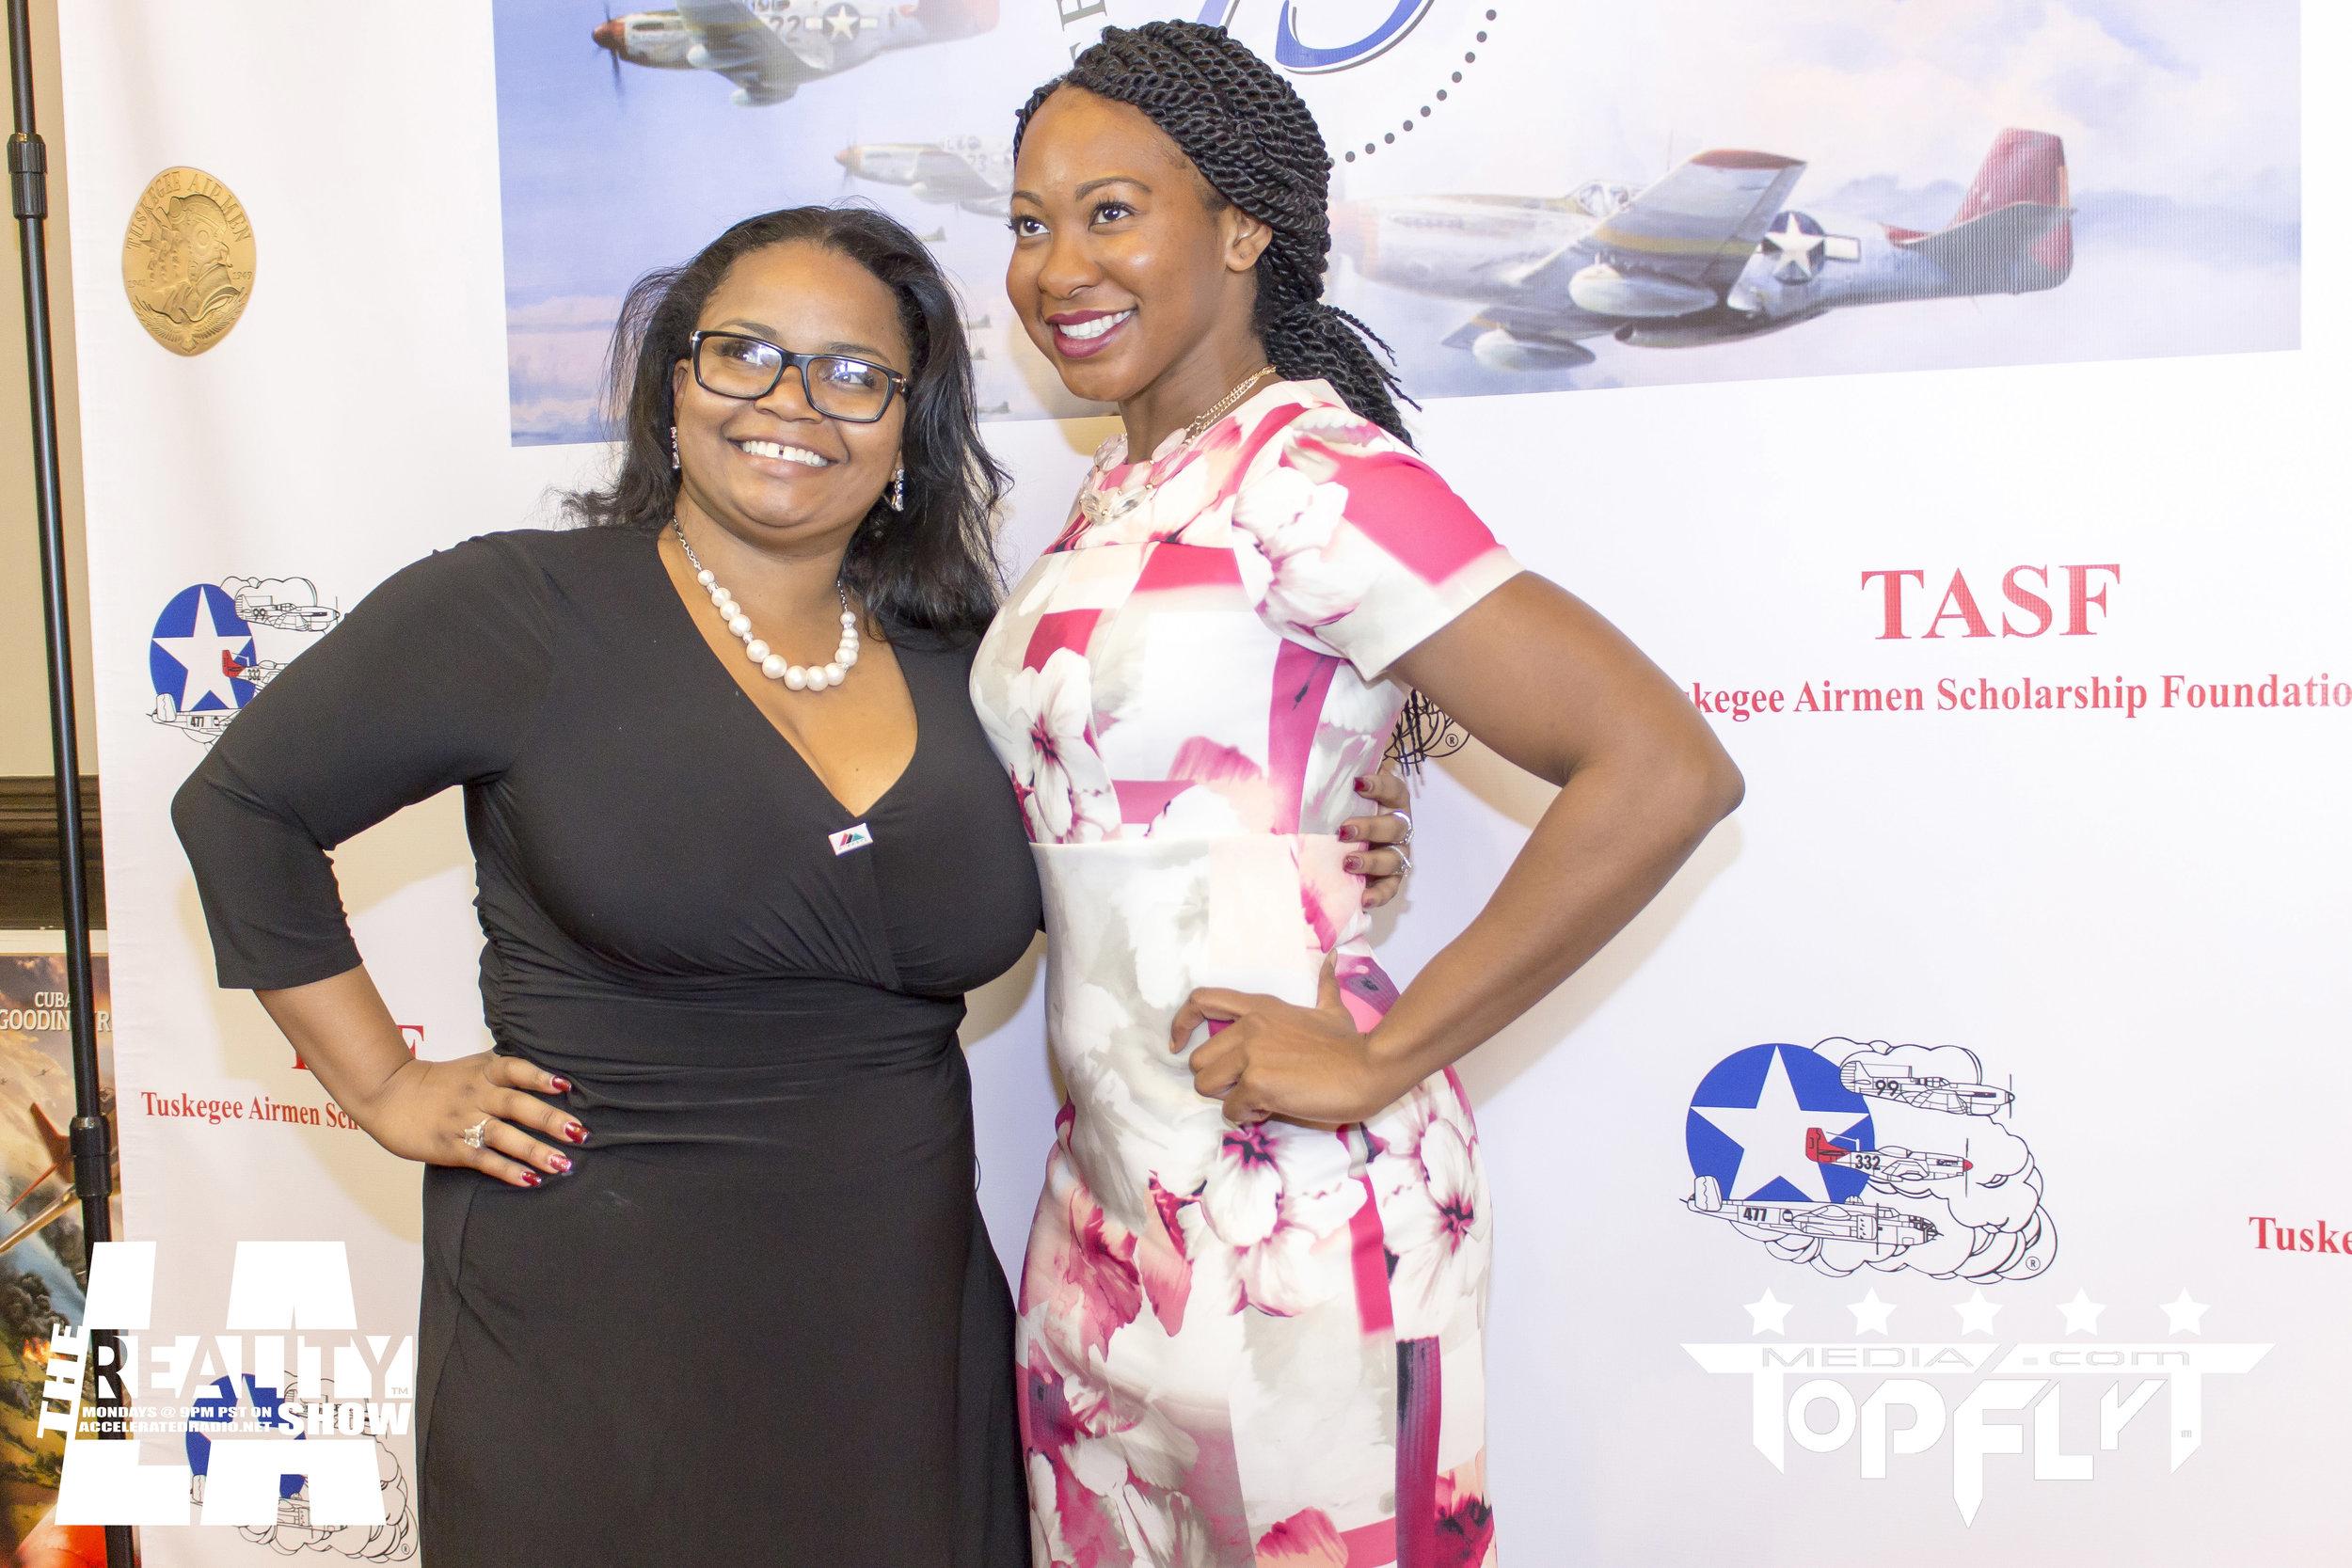 The Reality Show LA - Tuskegee Airmen 75th Anniversary VIP Reception_89.jpg